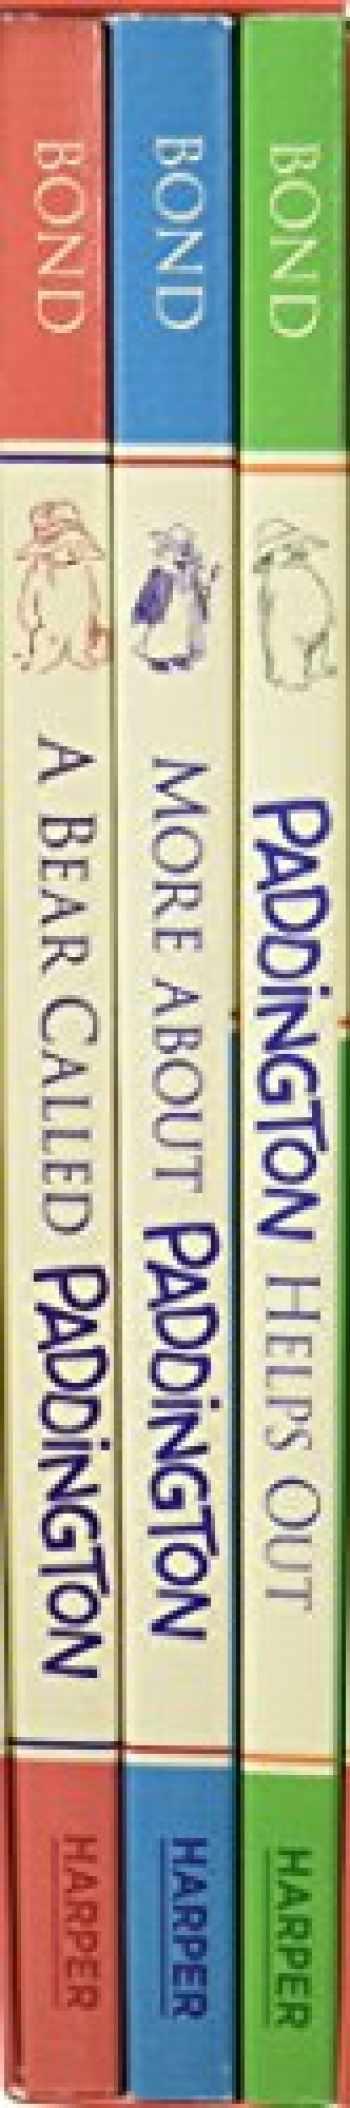 9780062422798-0062422790-Paddington Classic Adventures Box Set: A Bear Called Paddington, More About Paddington, Paddington Helps Out